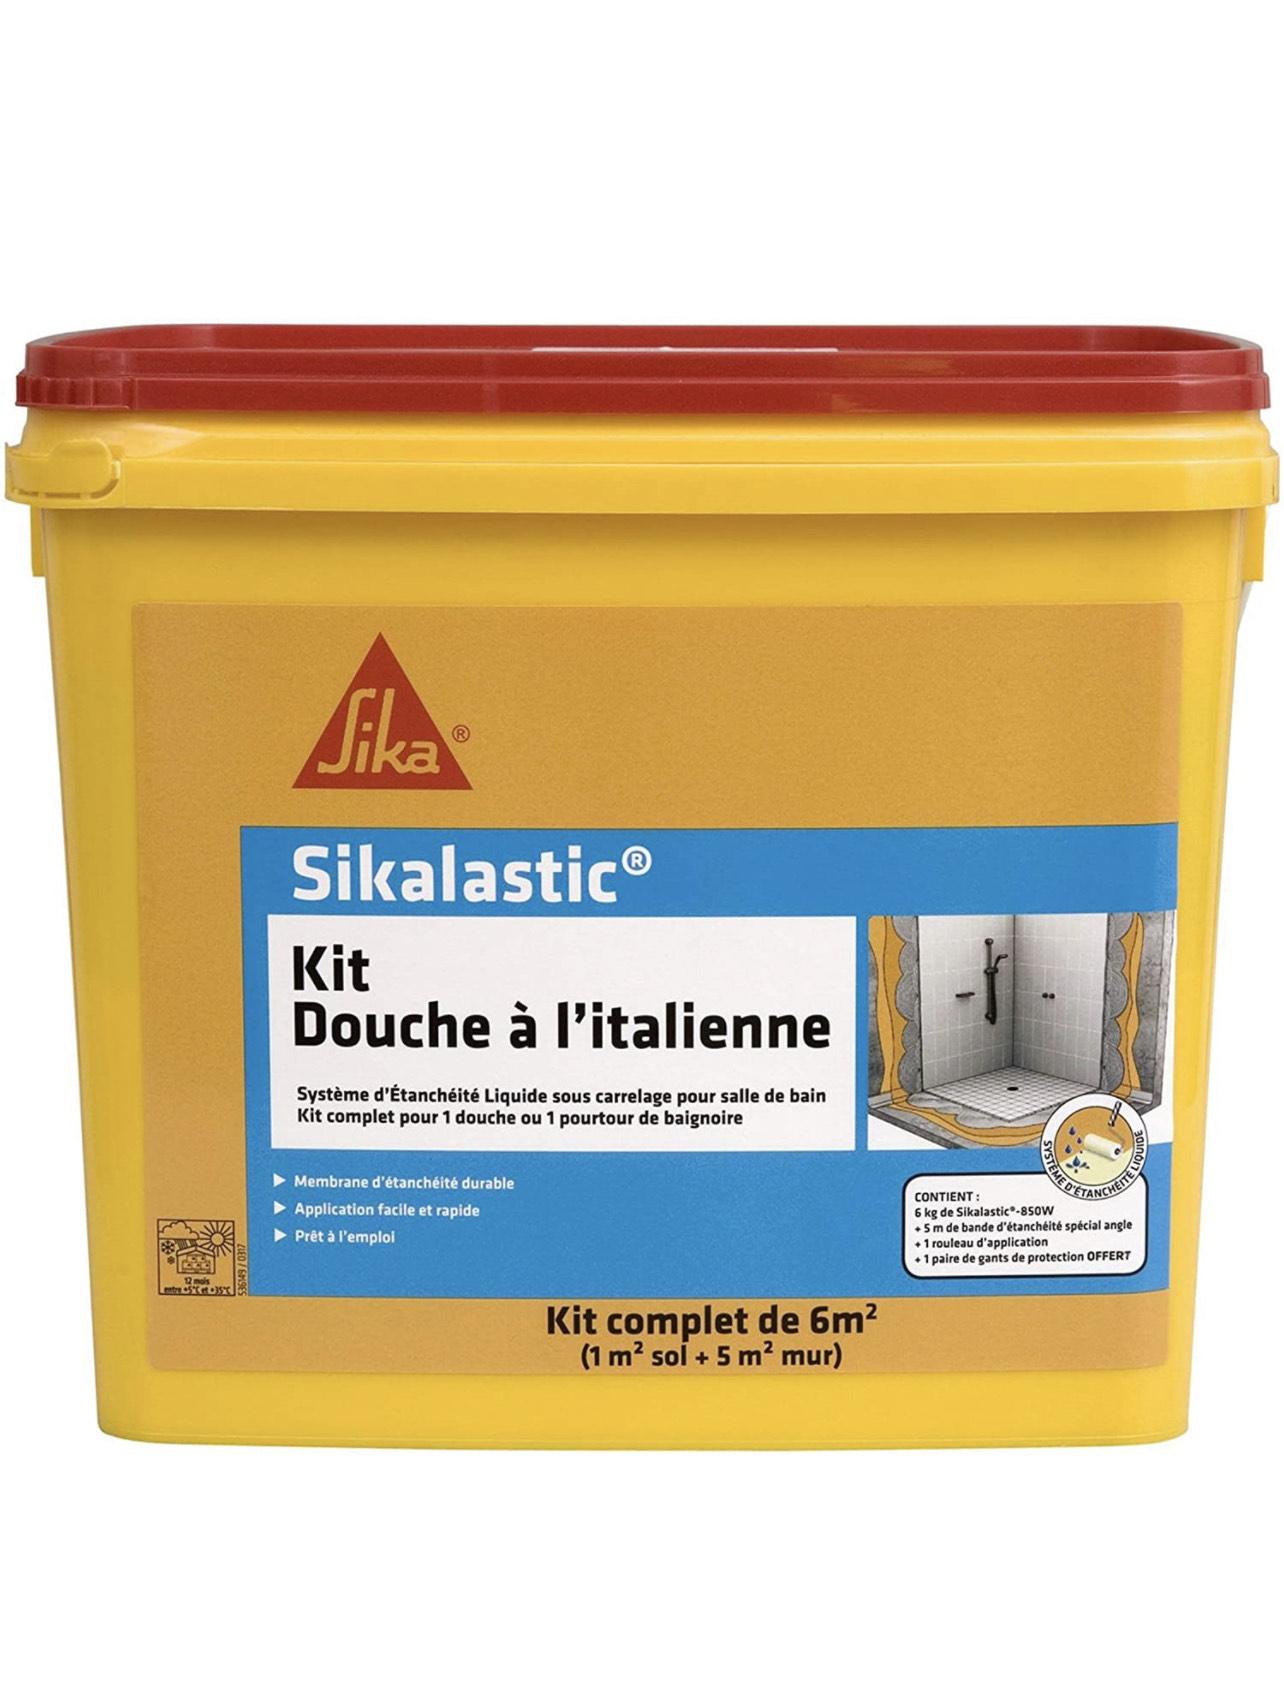 [Prime] Kit douche à l'italienne Sika - 6m²